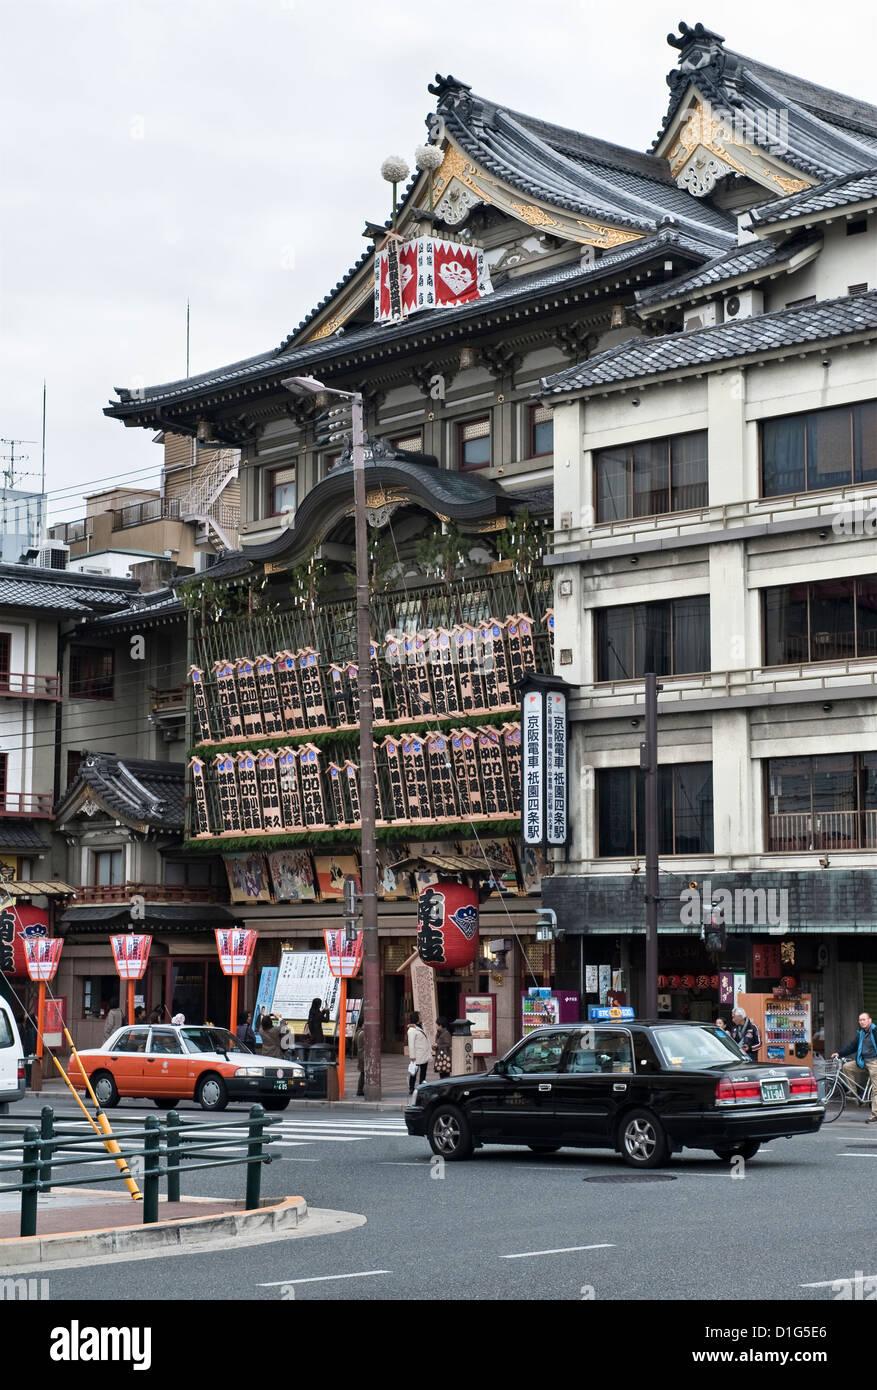 Kyoto, Japan. The kabuki theatre of Minami-za, founded in 1610 and rebuilt in 1929, the oldest kabuki venue in Japan - Stock Image